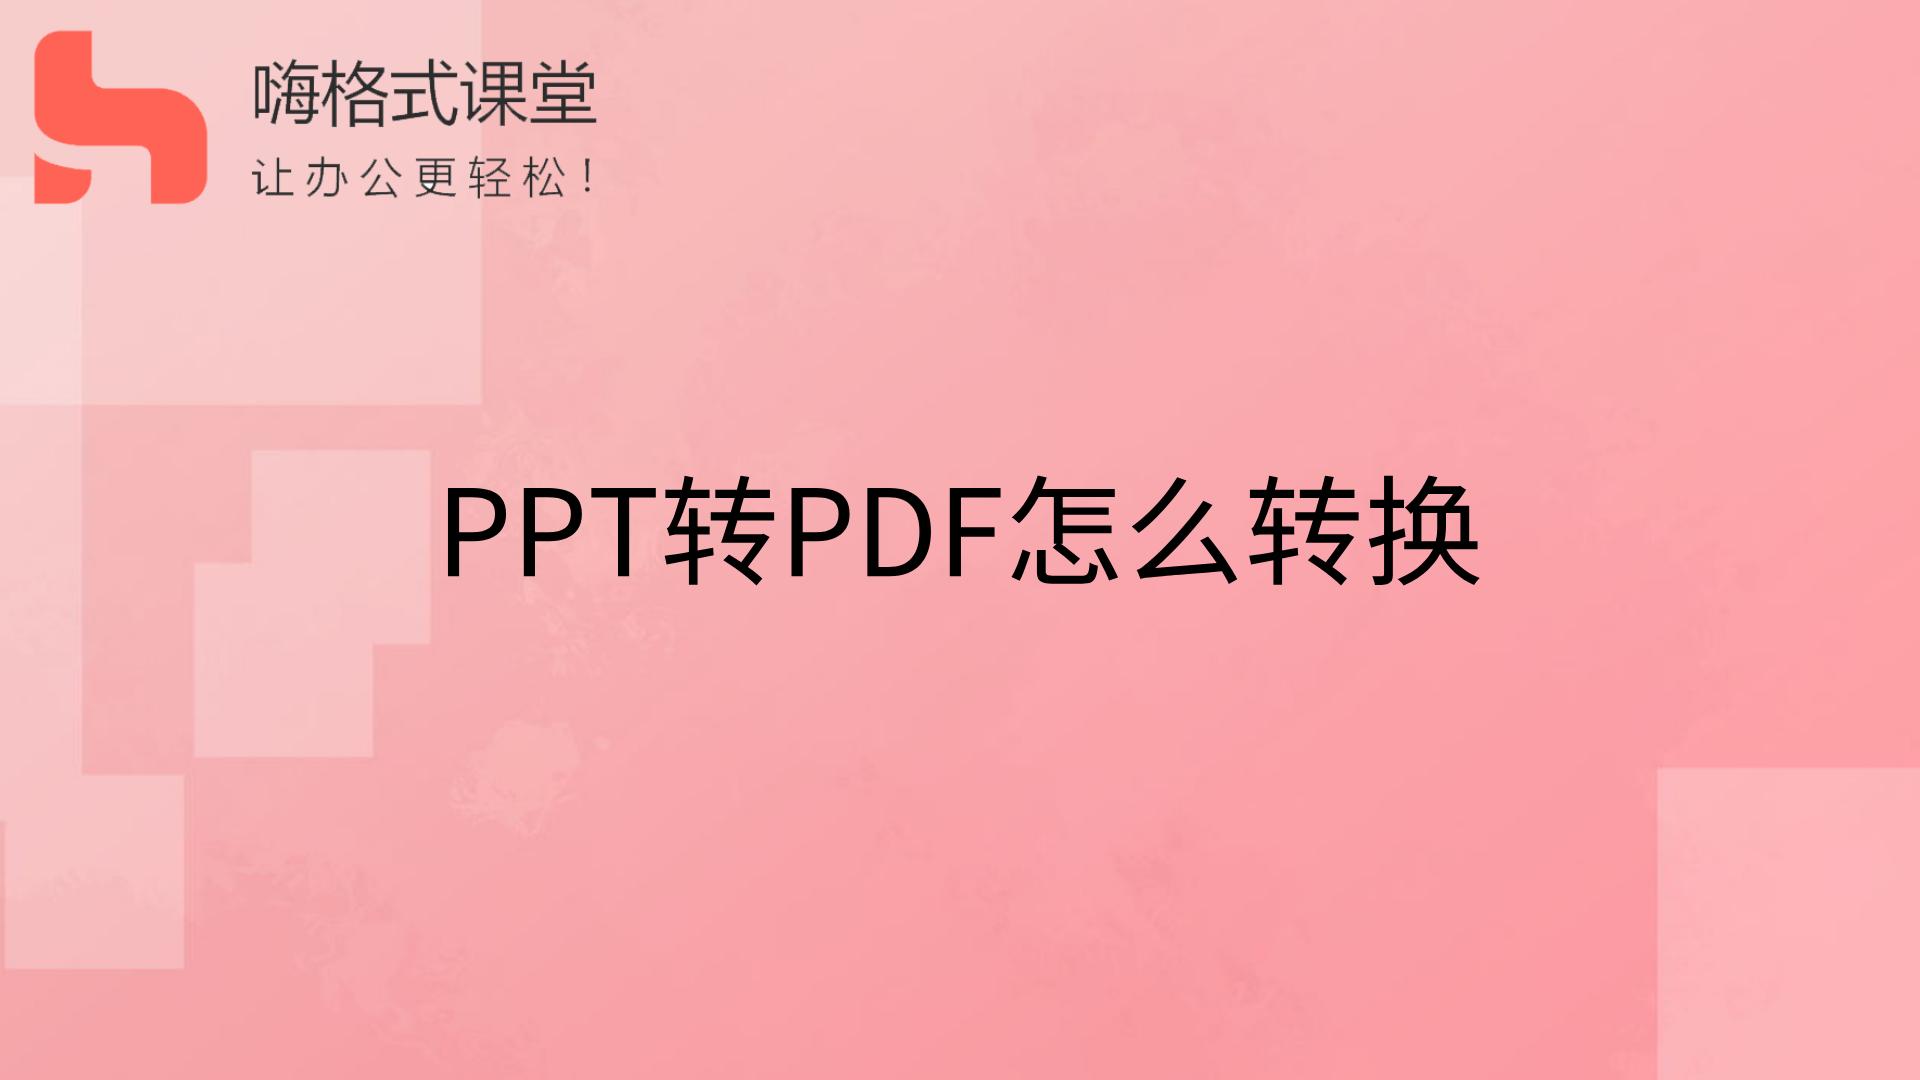 PPT转PDF怎么转换s